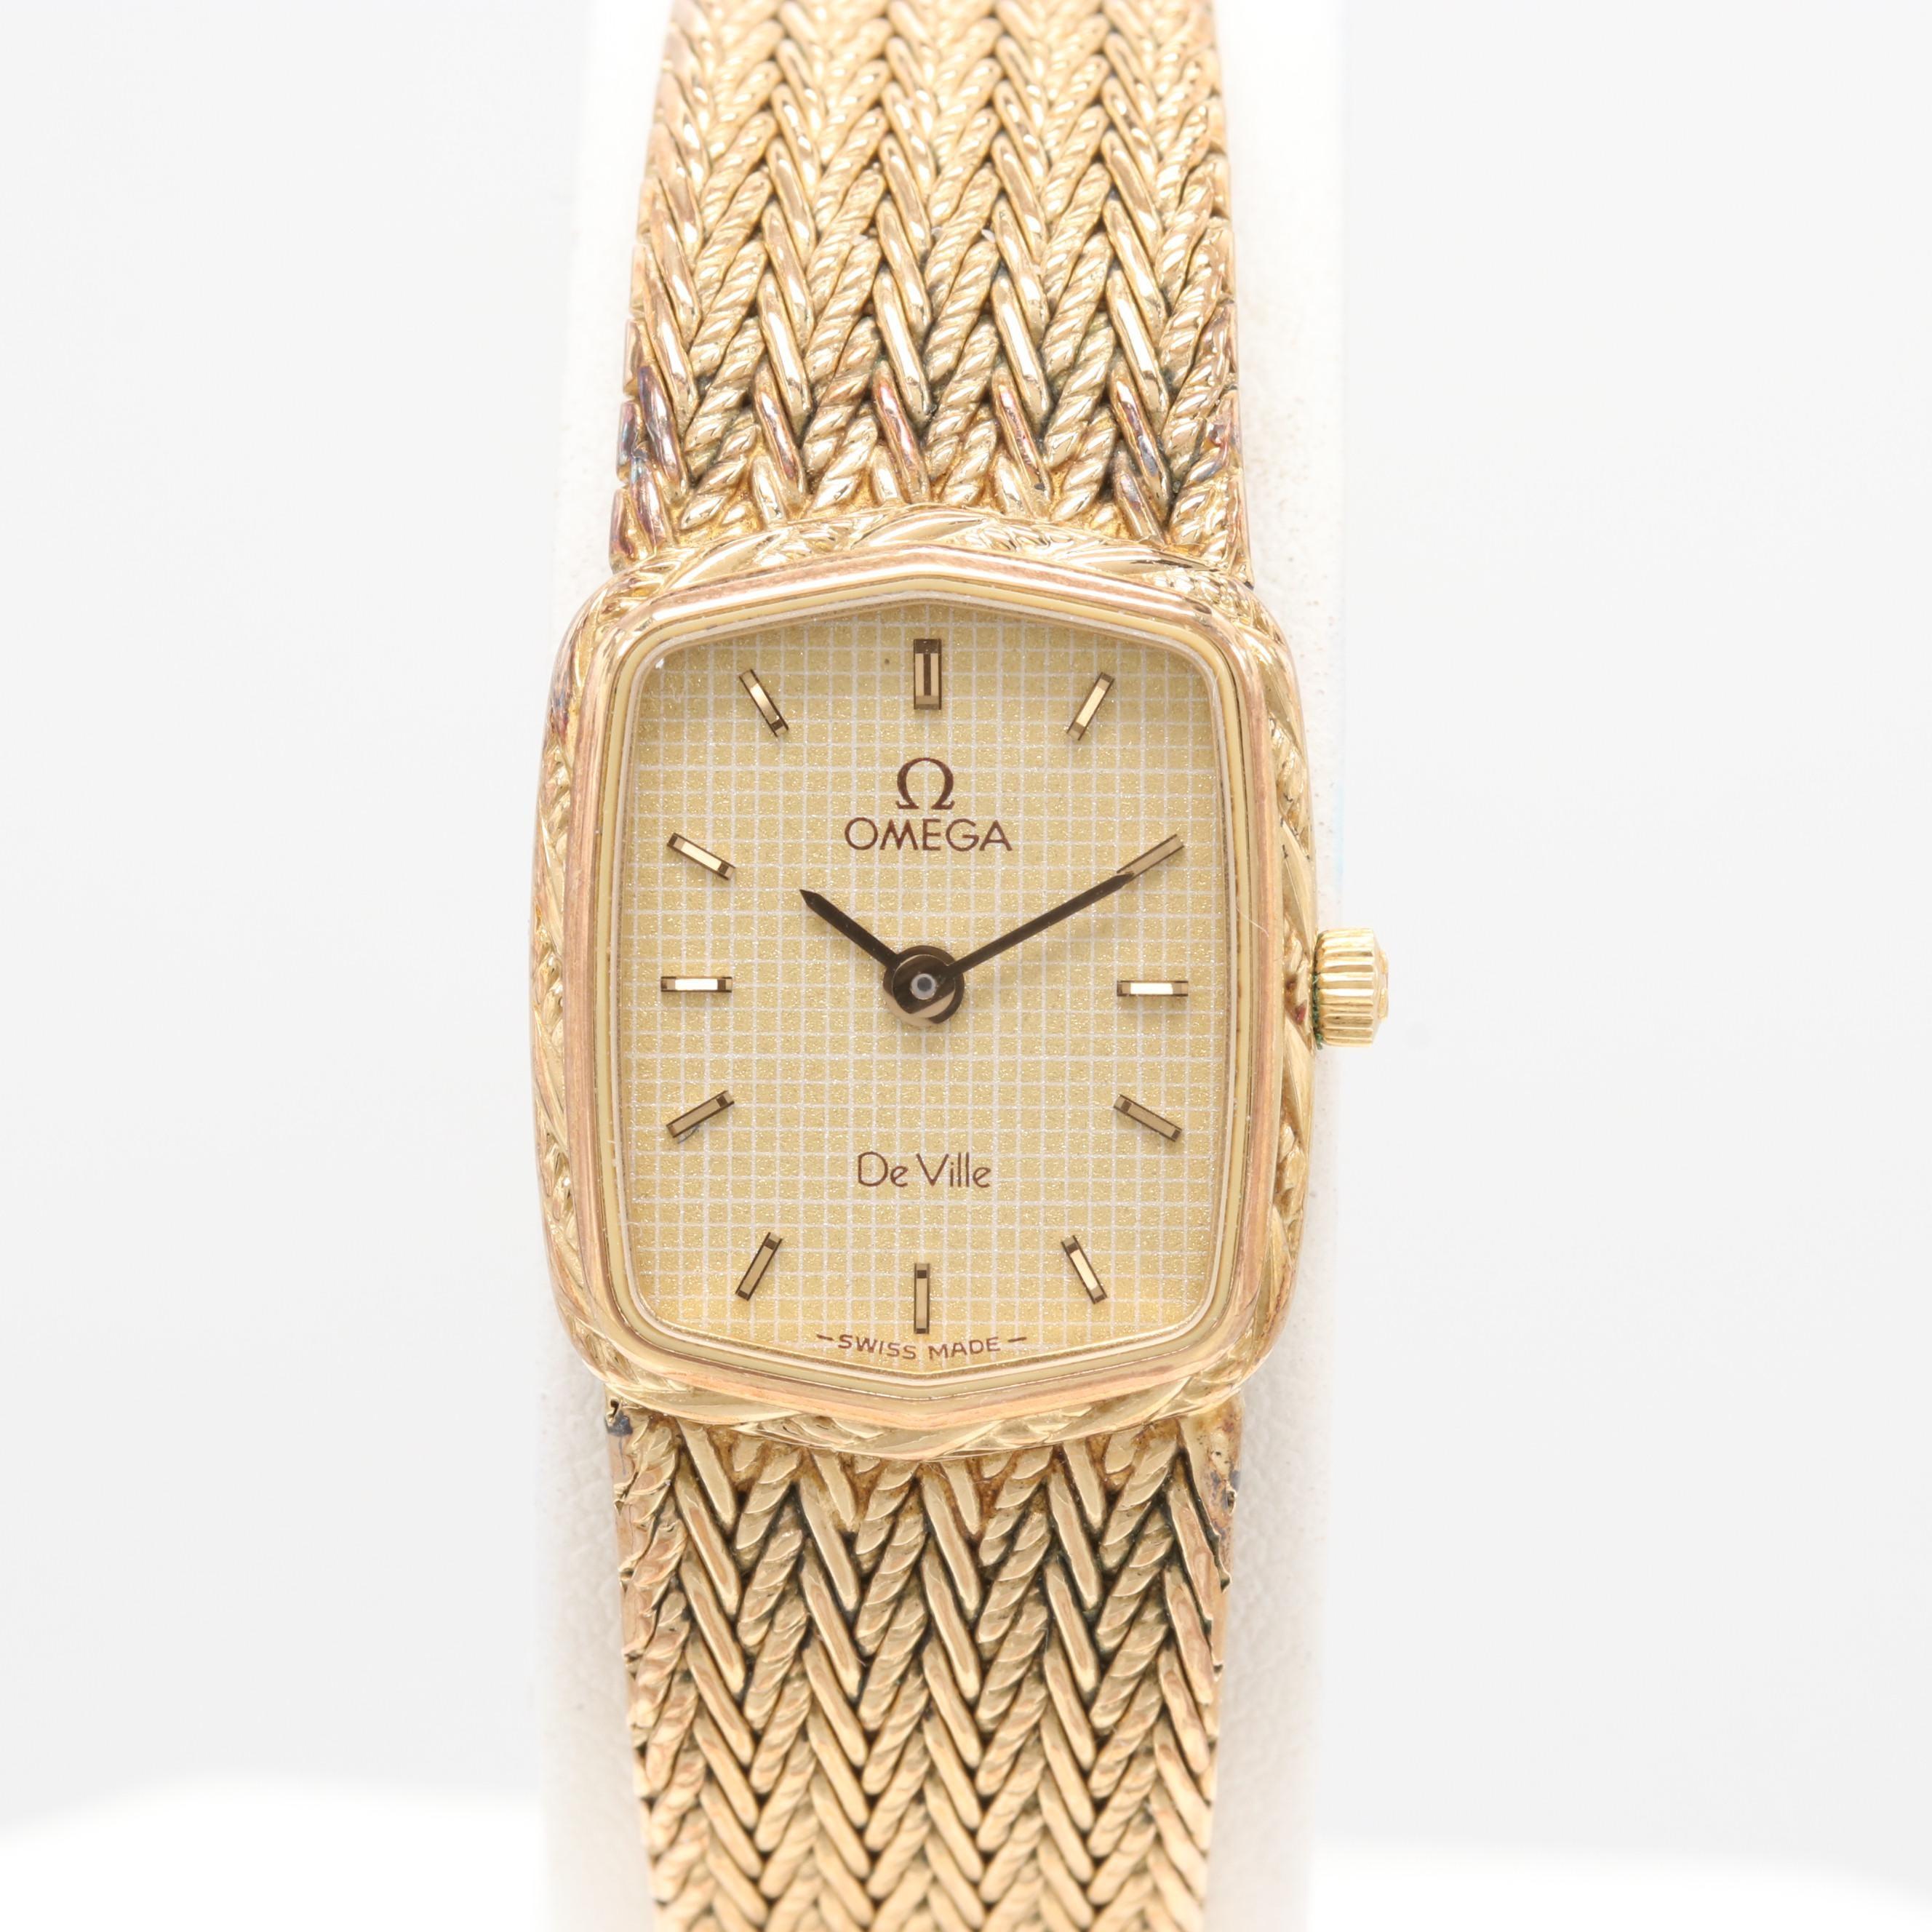 Omega DeVille 1375 Quartz Gold Plated Wristwatch